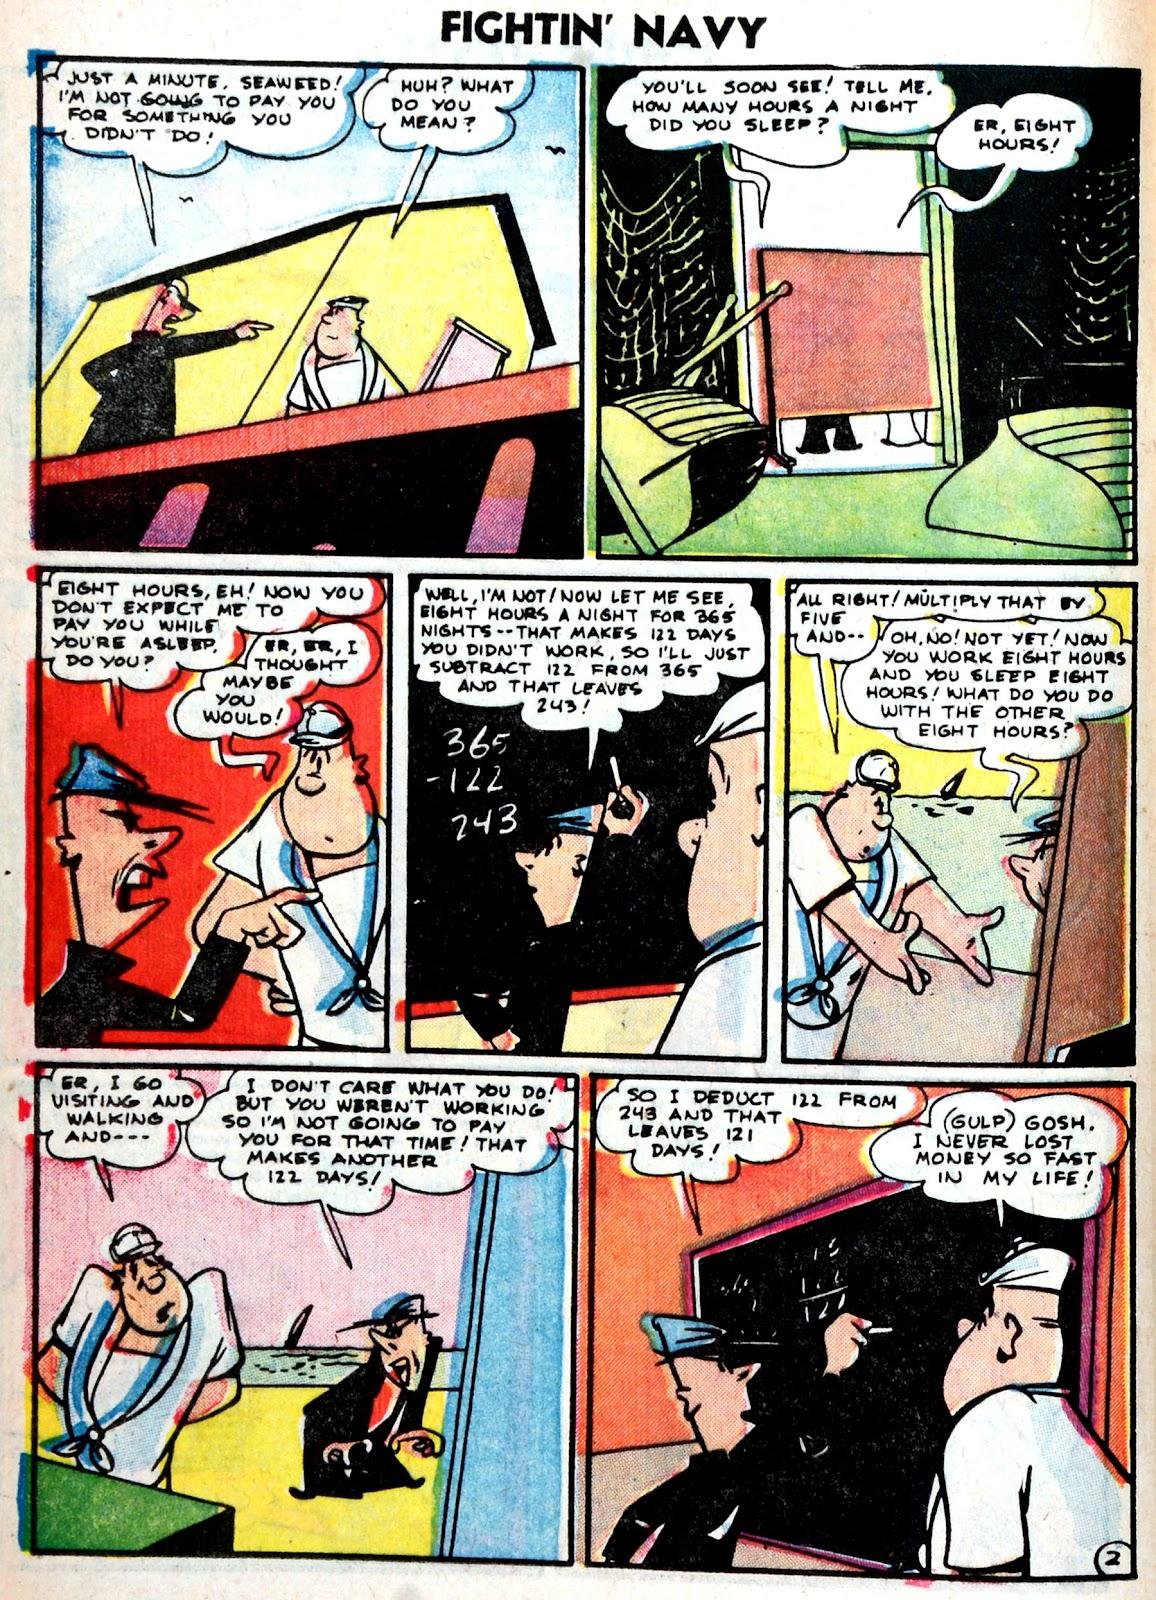 Read online Fightin' Navy comic -  Issue #75 - 20